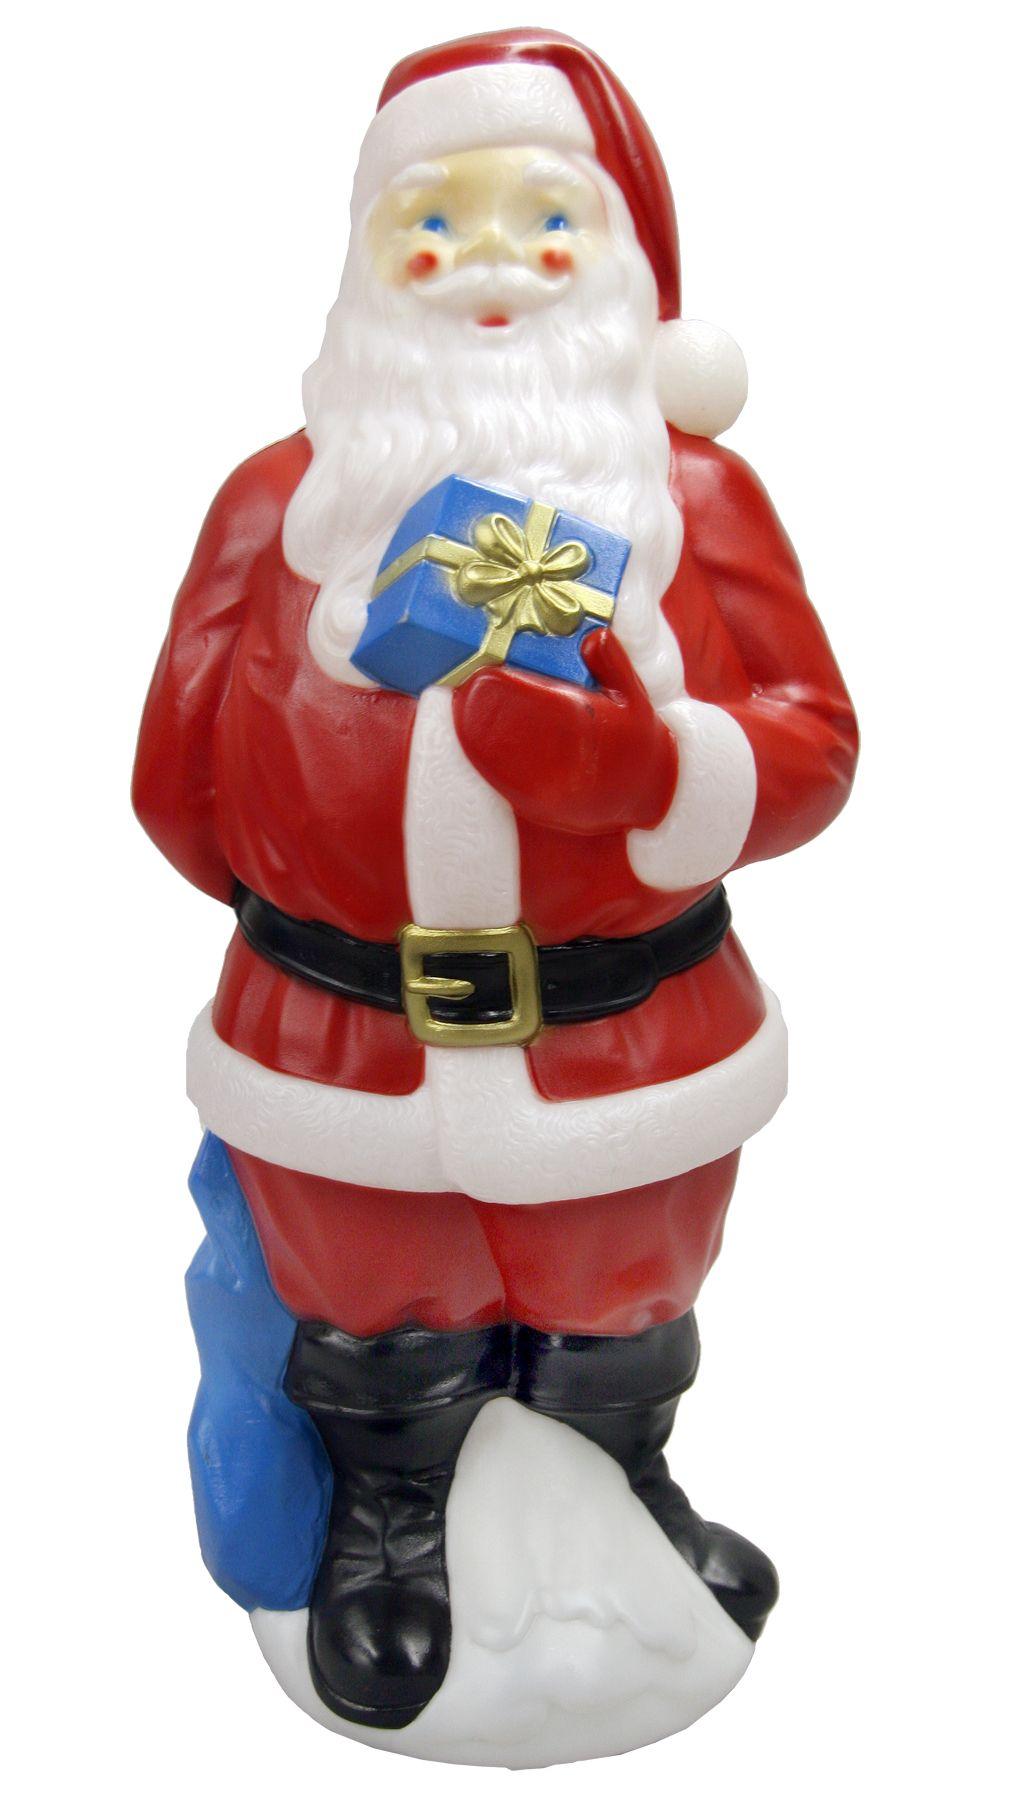 General Foam Plastics 34 Outdoor Light Up Blow Mold Santa